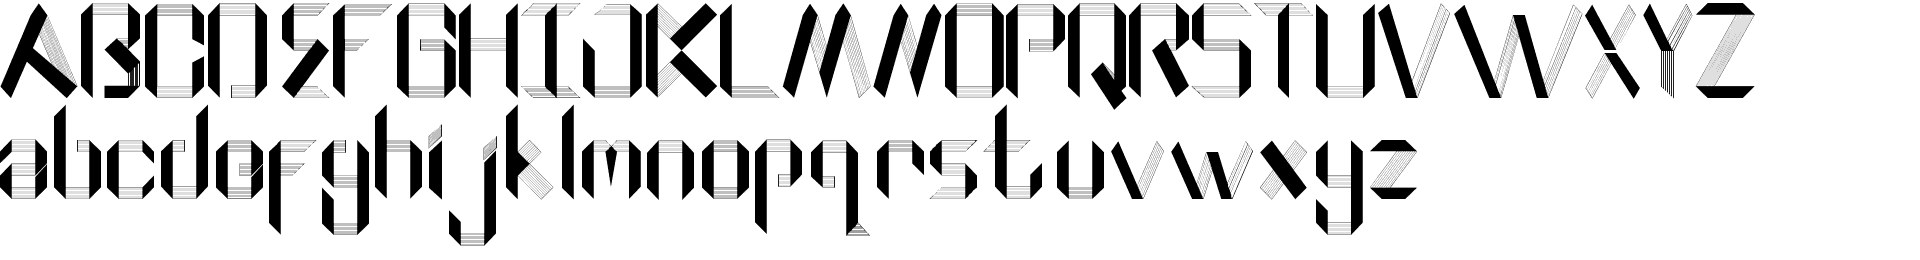 Rodriguez_Geometric Paper